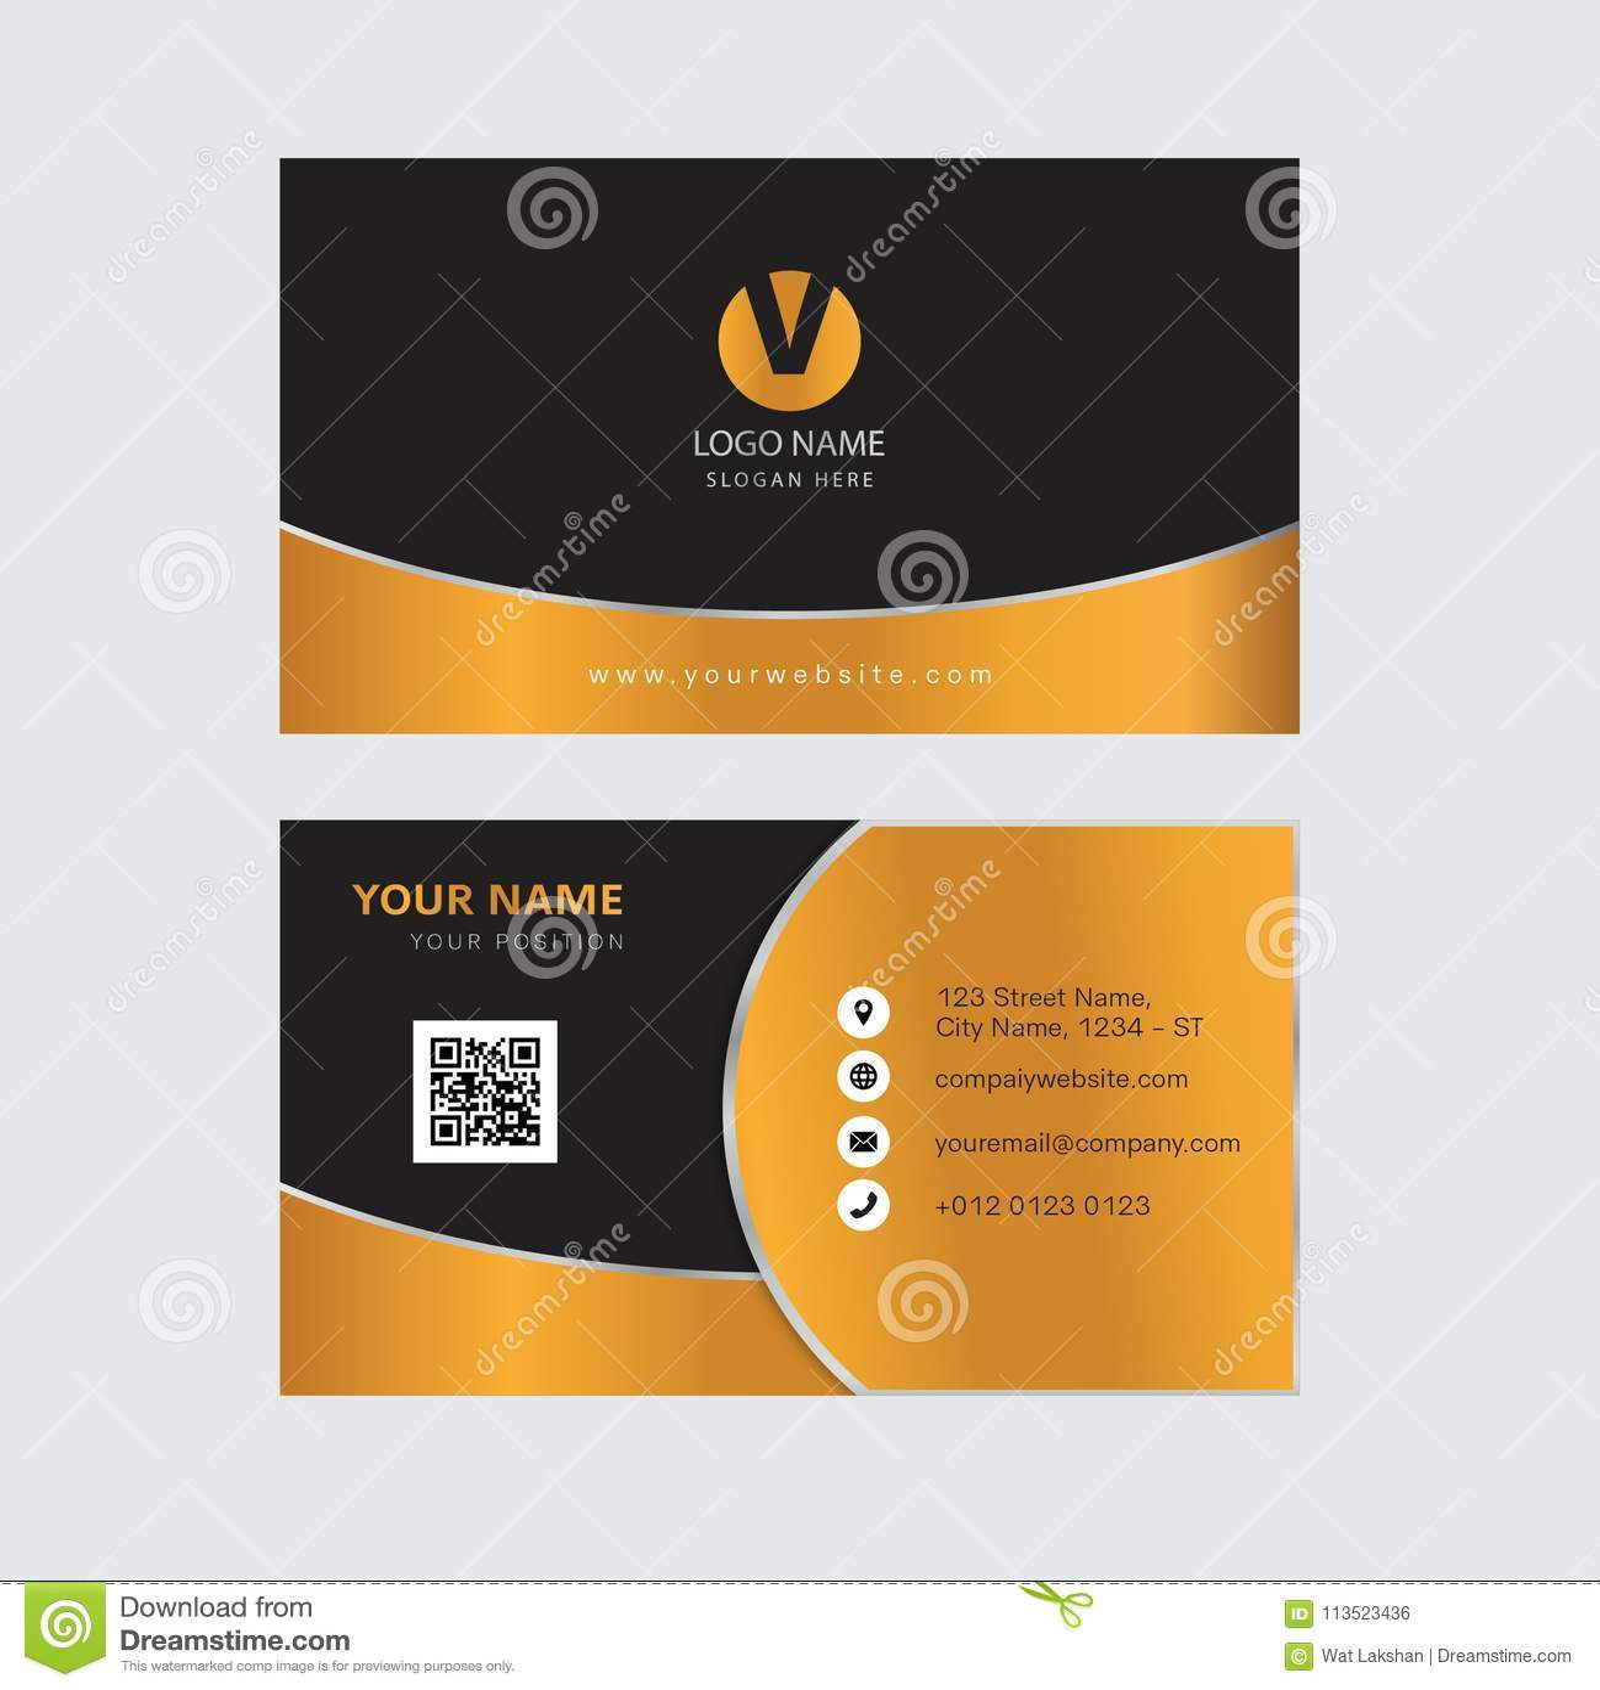 Creative gold color business card design stock vector illustration download creative gold color business card design stock vector illustration of illustration backdrop reheart Images